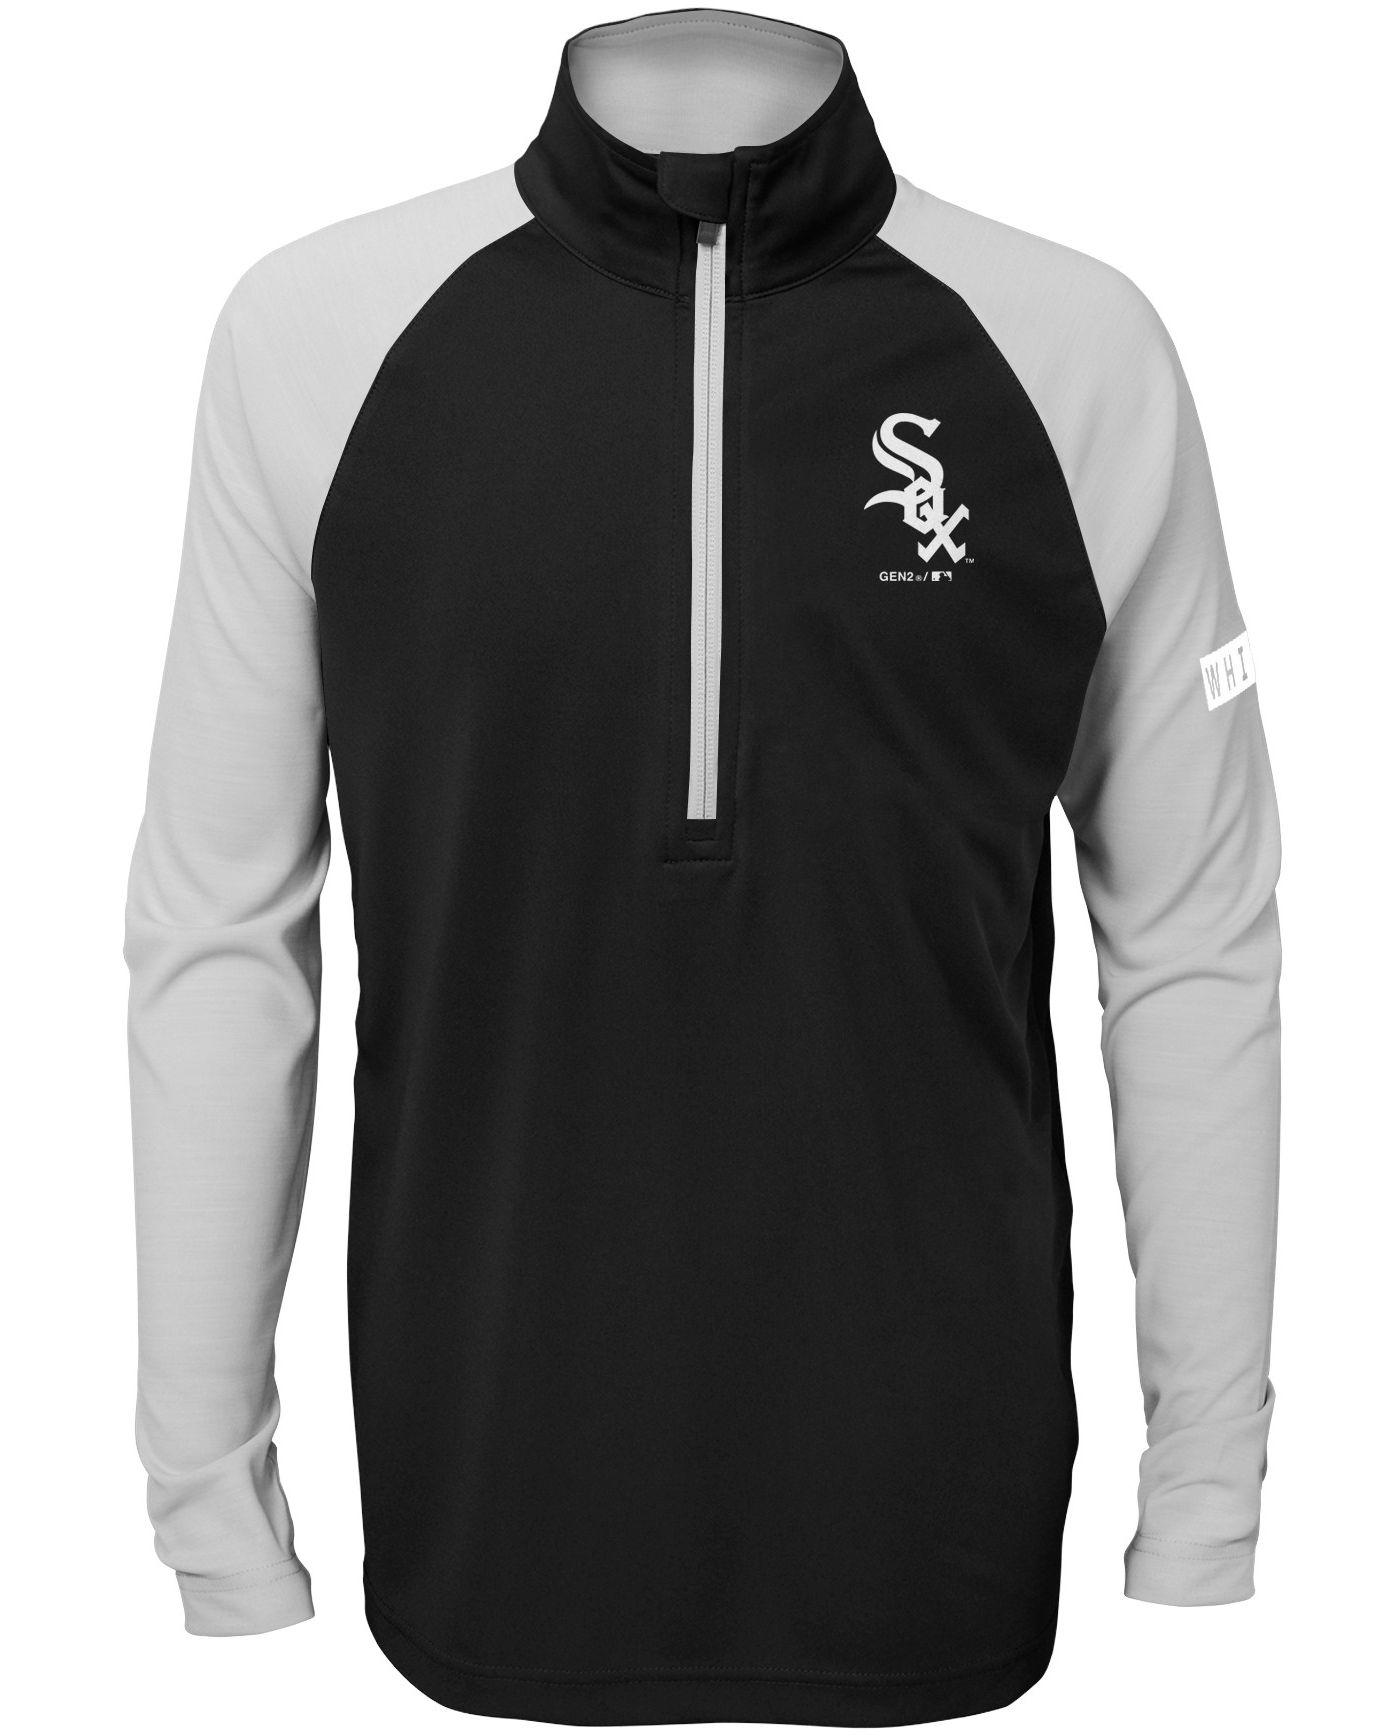 Gen2 Youth Chicago White Sox Half-Zip Pullover